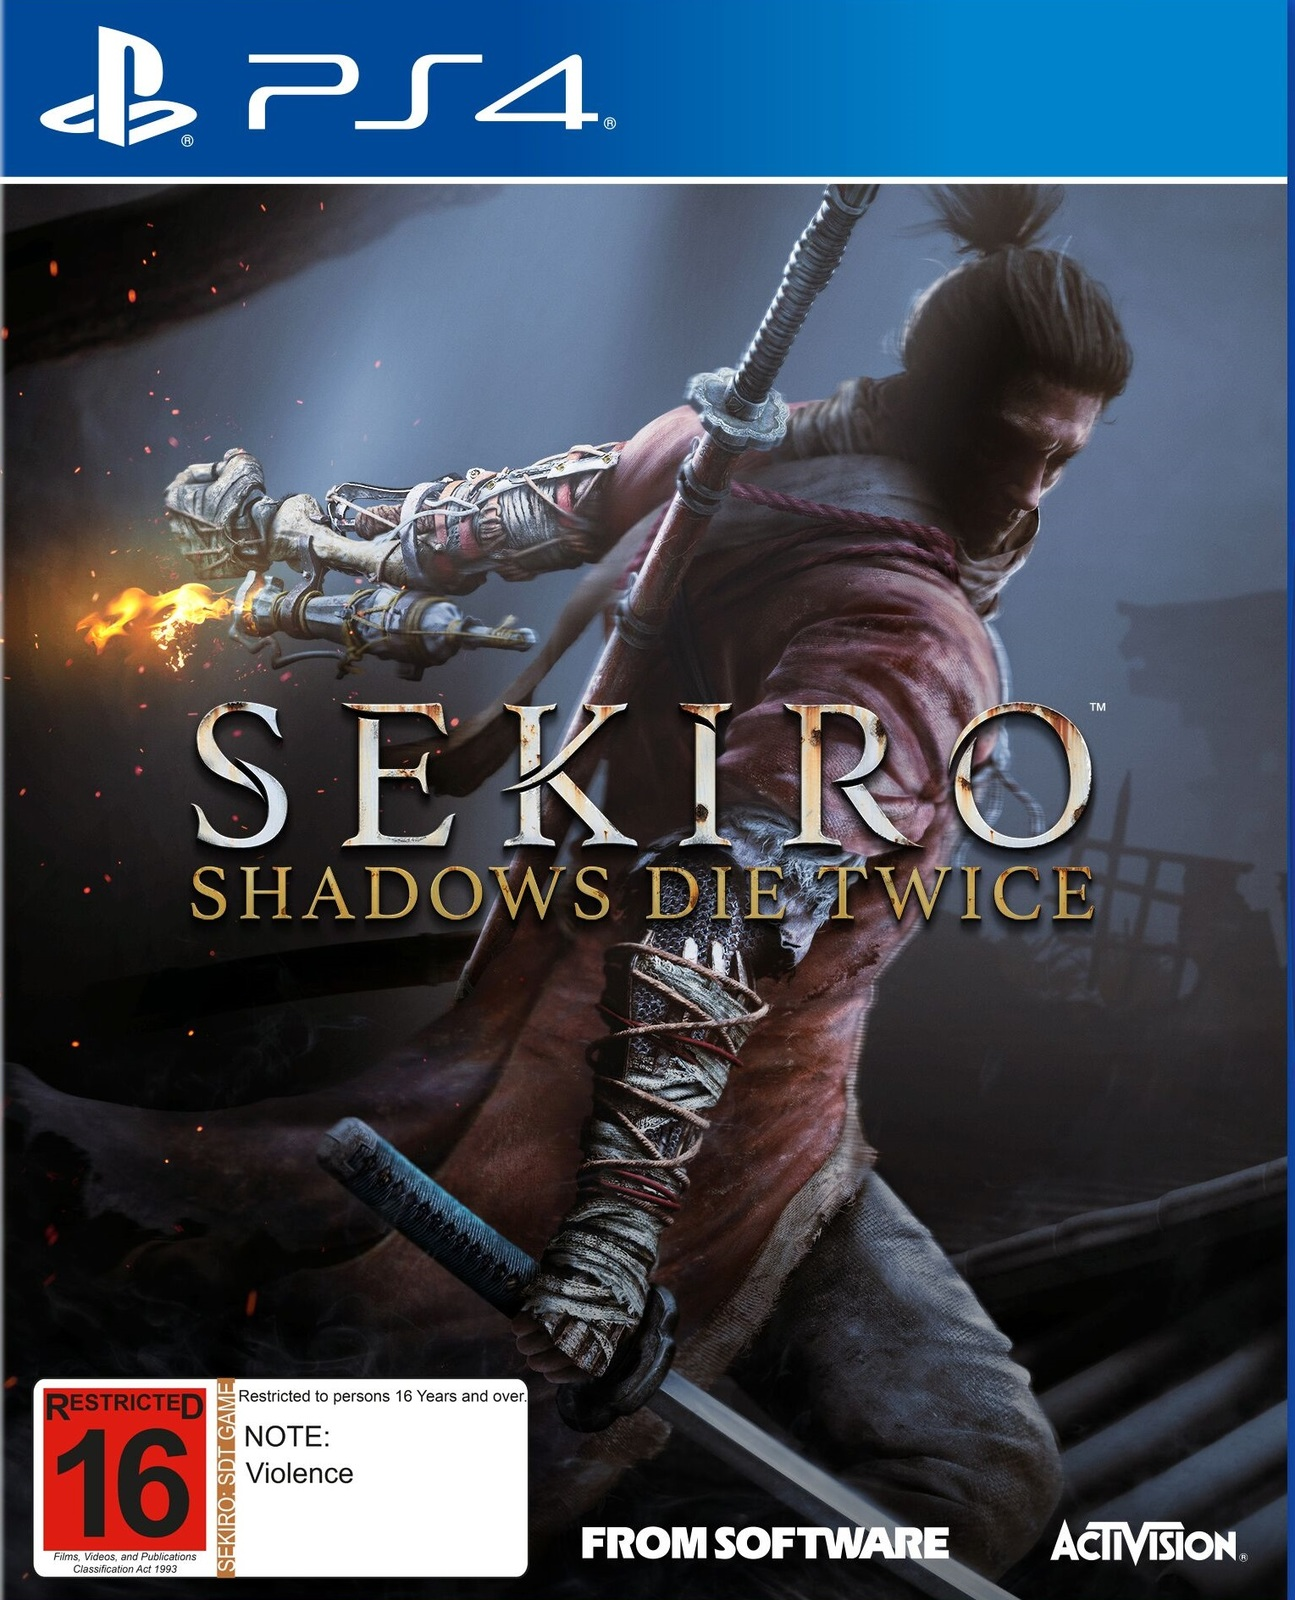 Sekiro: Shadows Die Twice for PS4 image